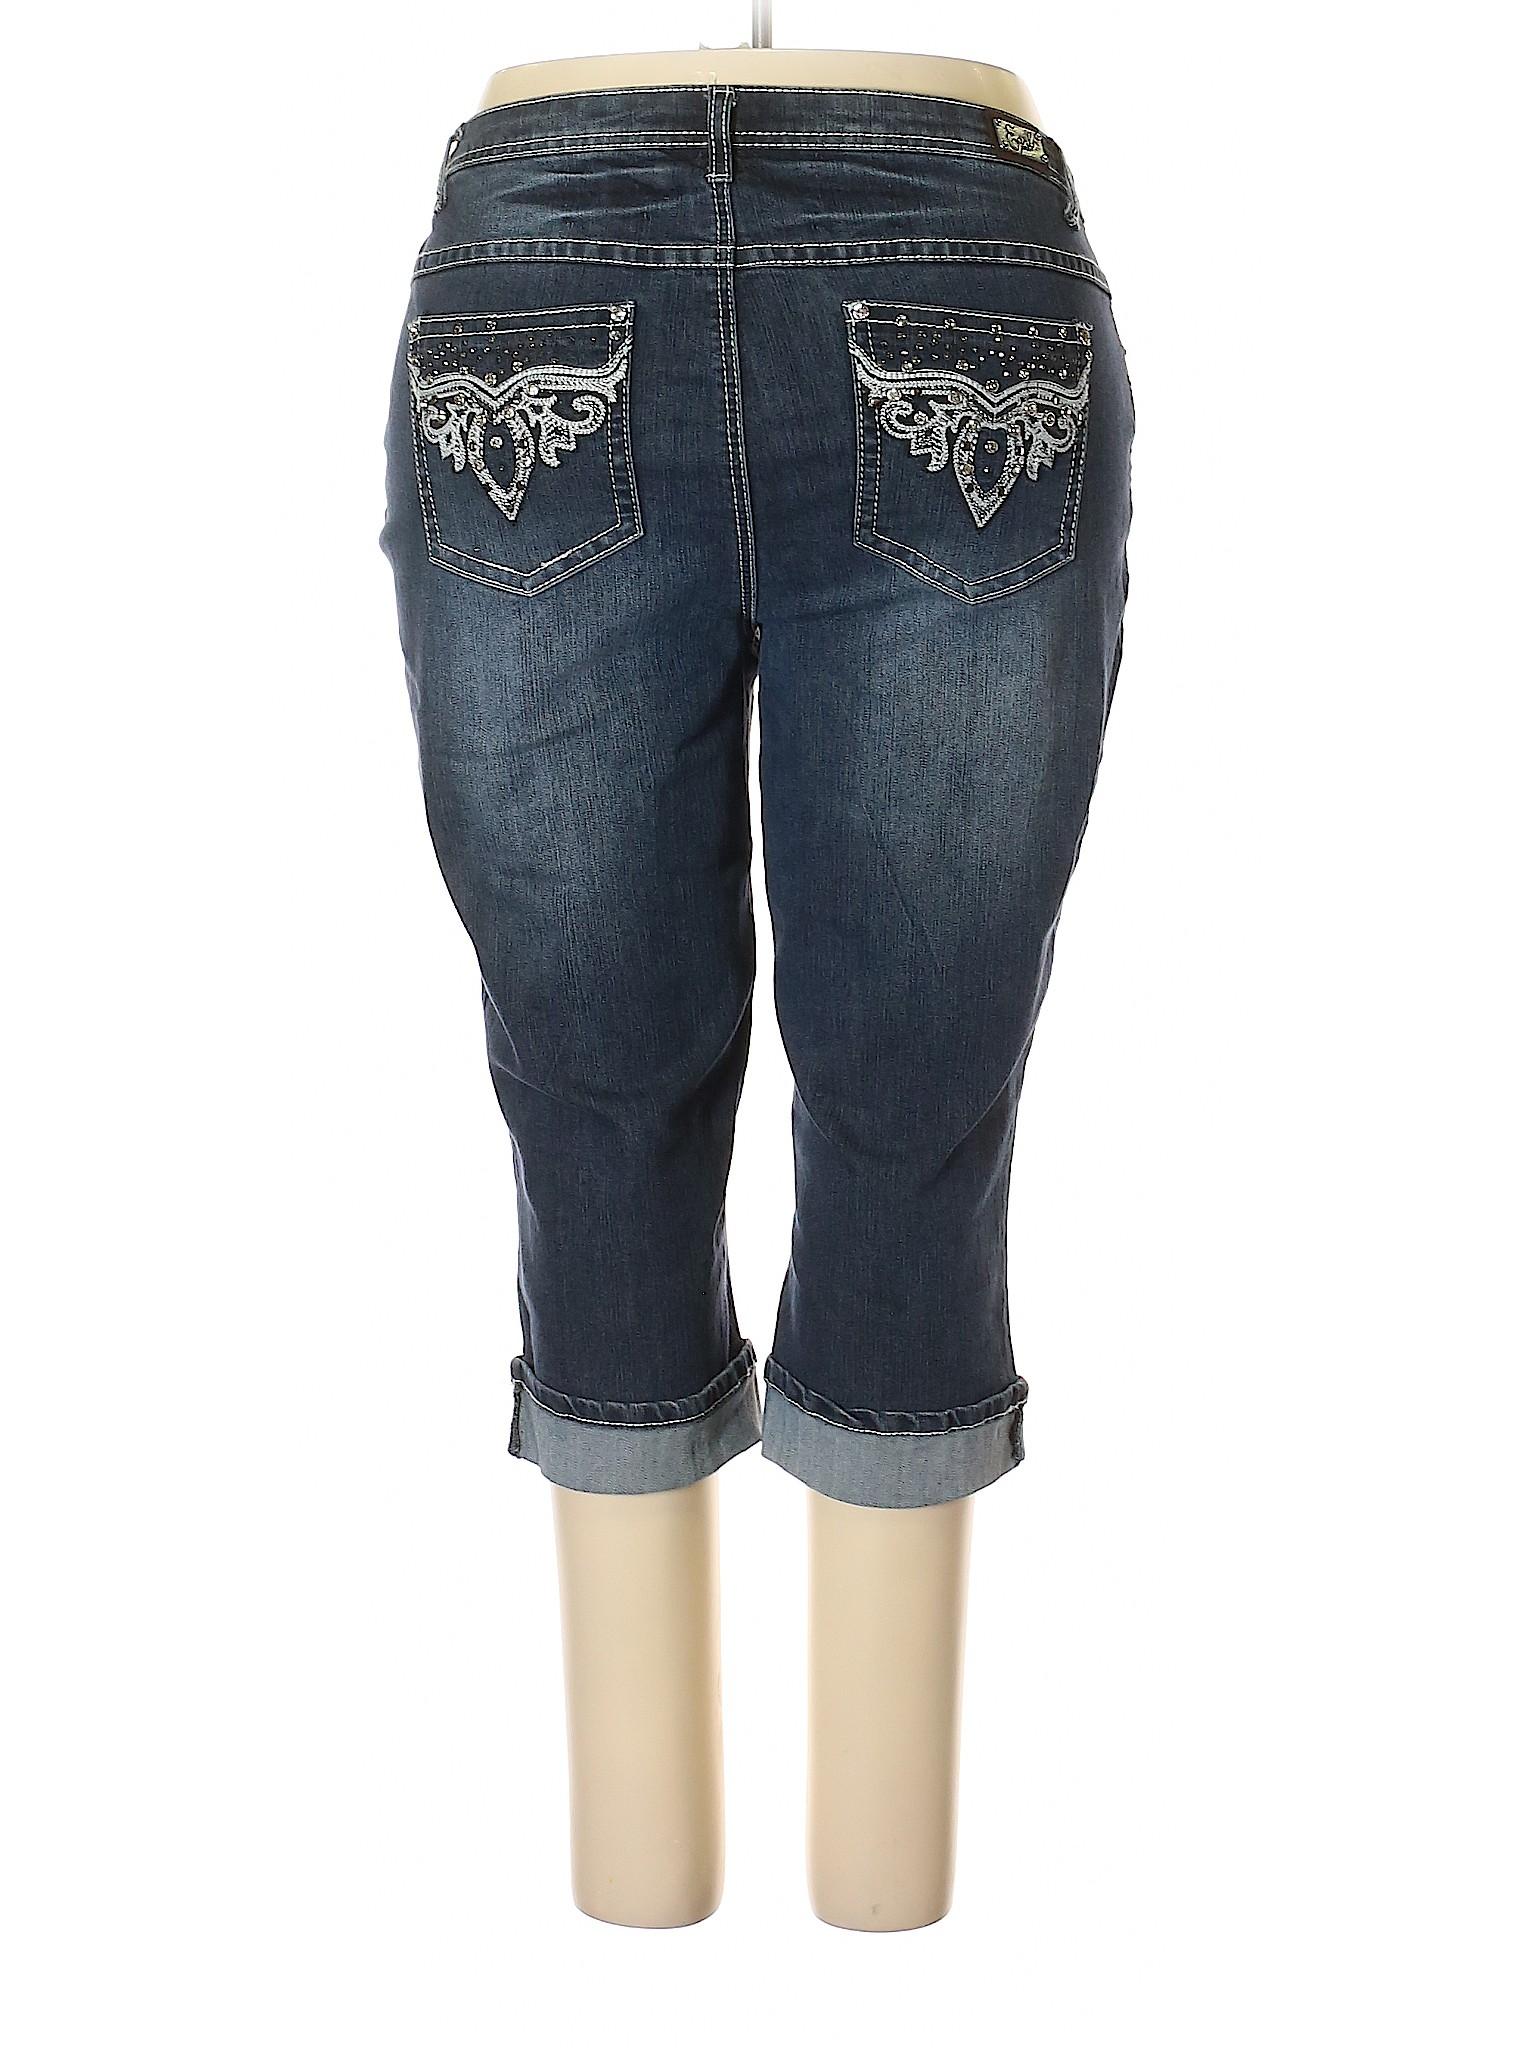 f1cd9709b90 Earl Jean Solid Navy Blue Jeans Size 20w (Plus) - 83% off